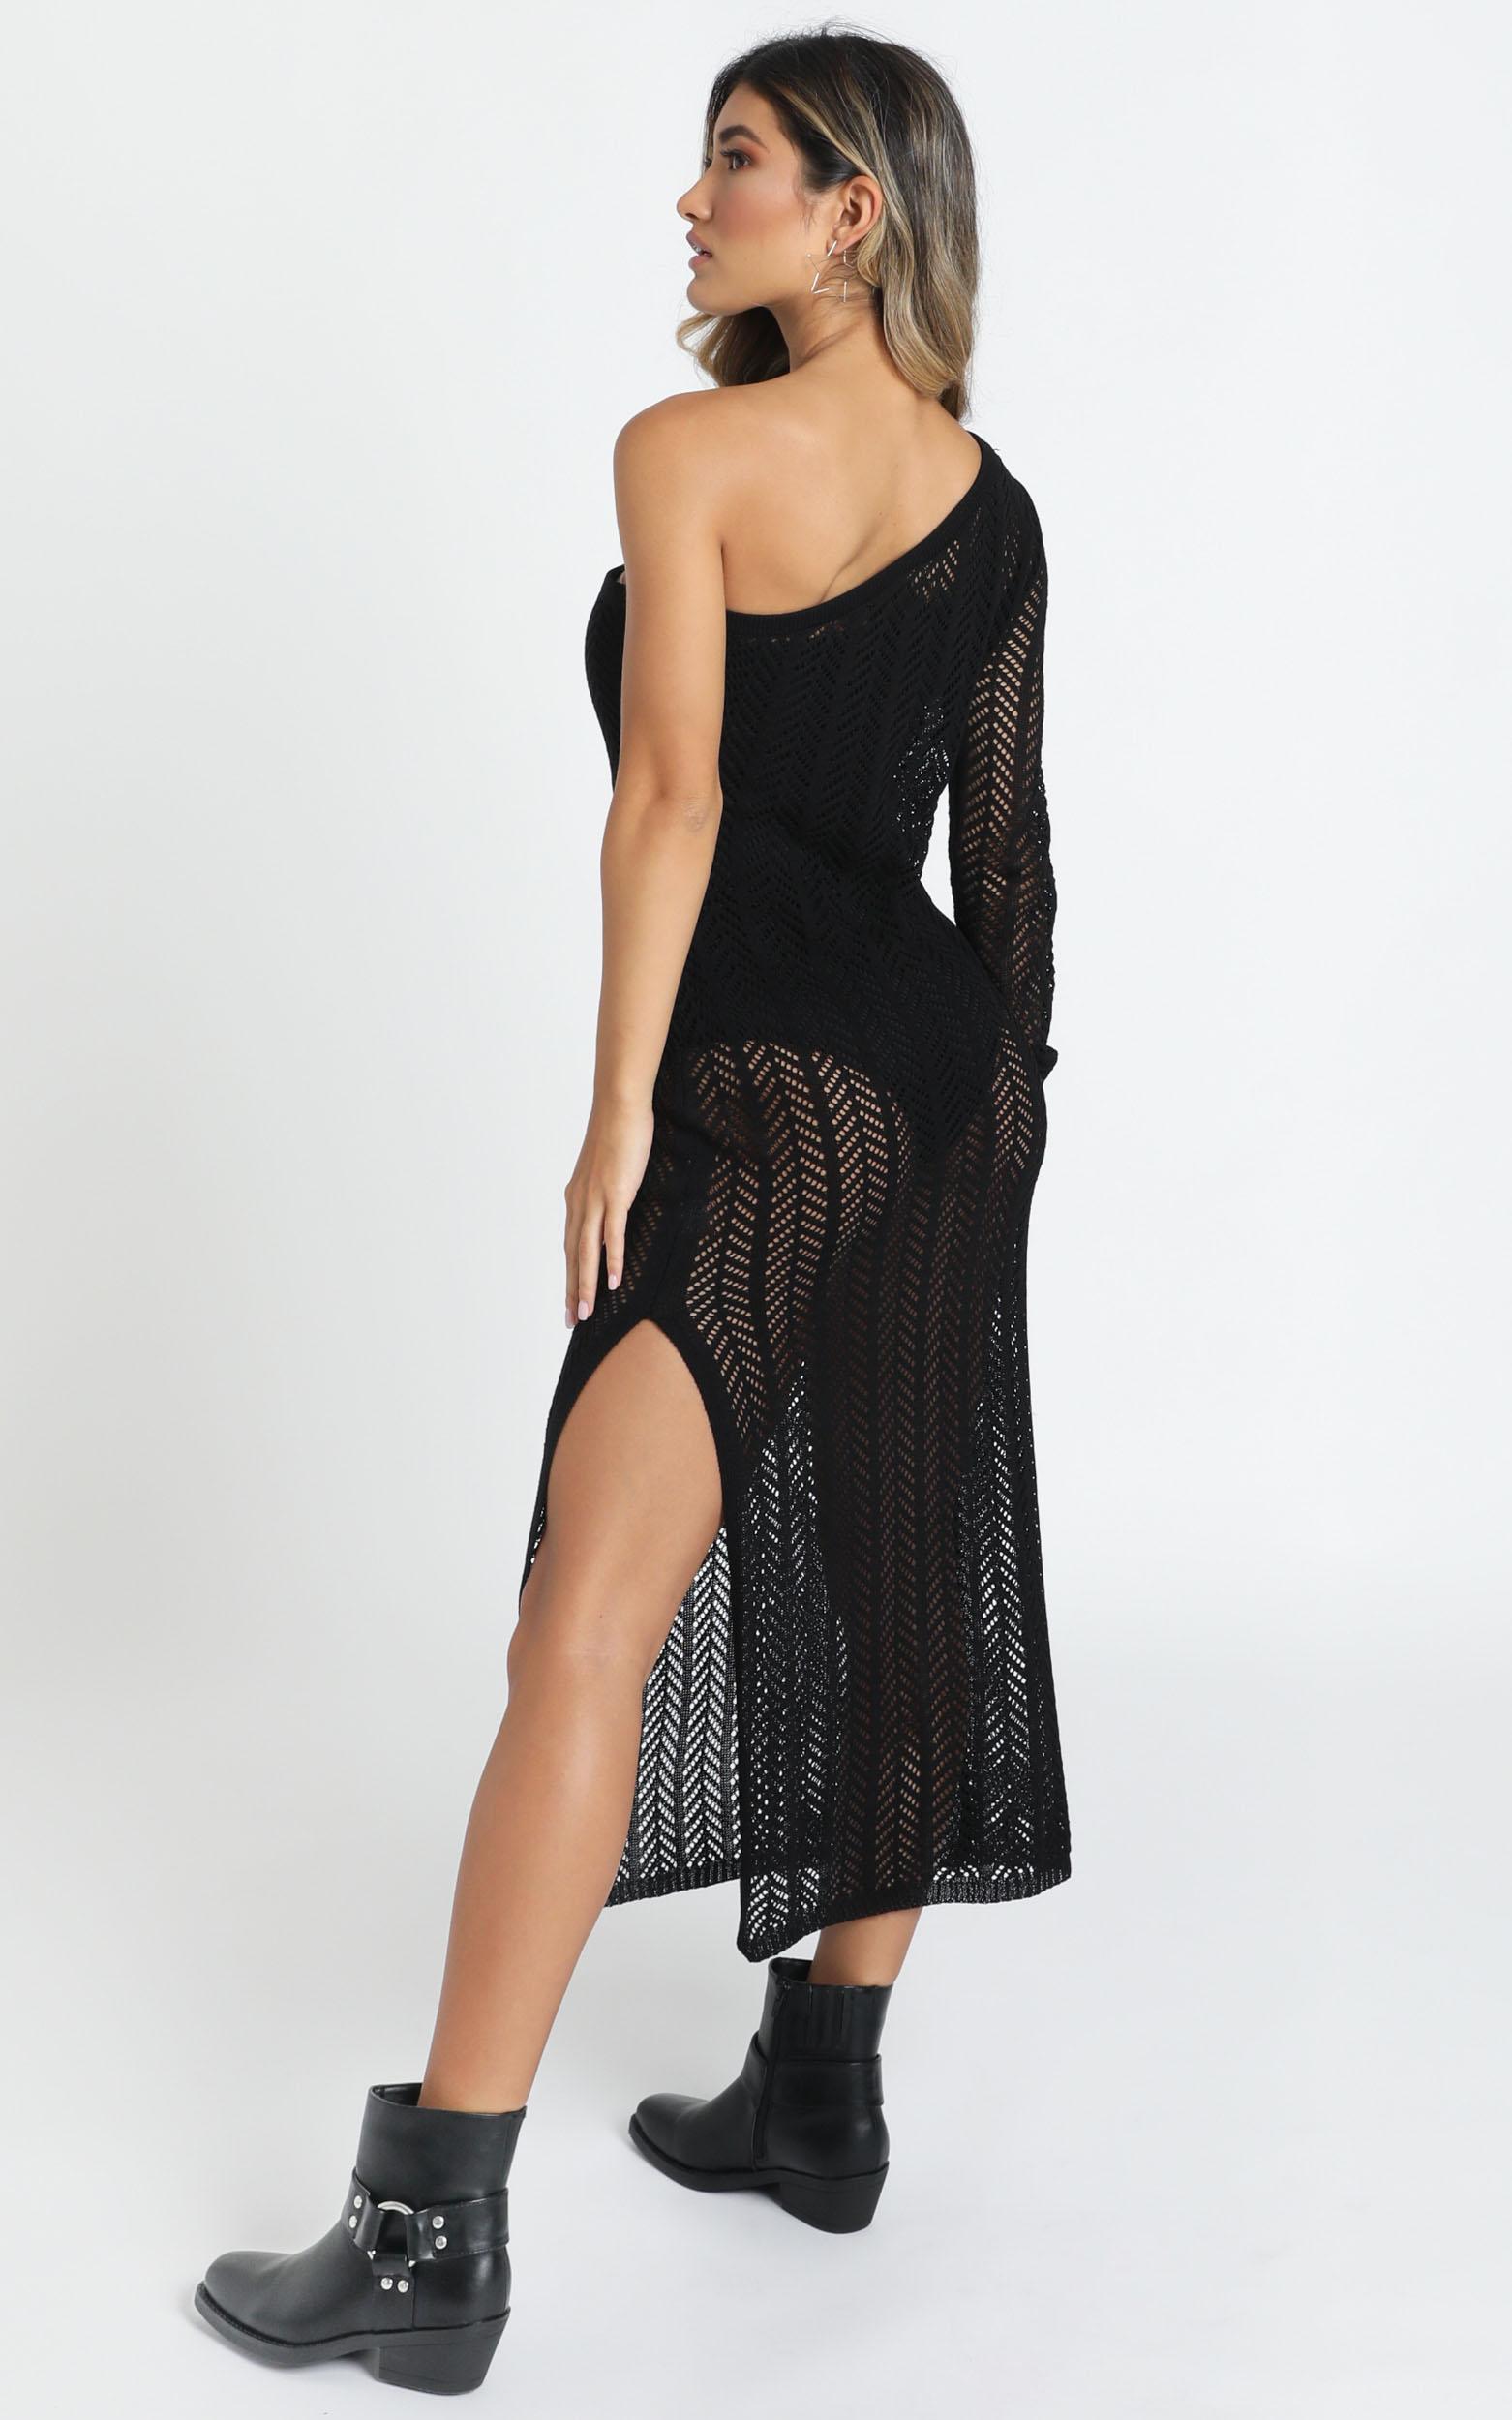 Drop Your Love Knit Dress in black - 14 (XL), Black, hi-res image number null